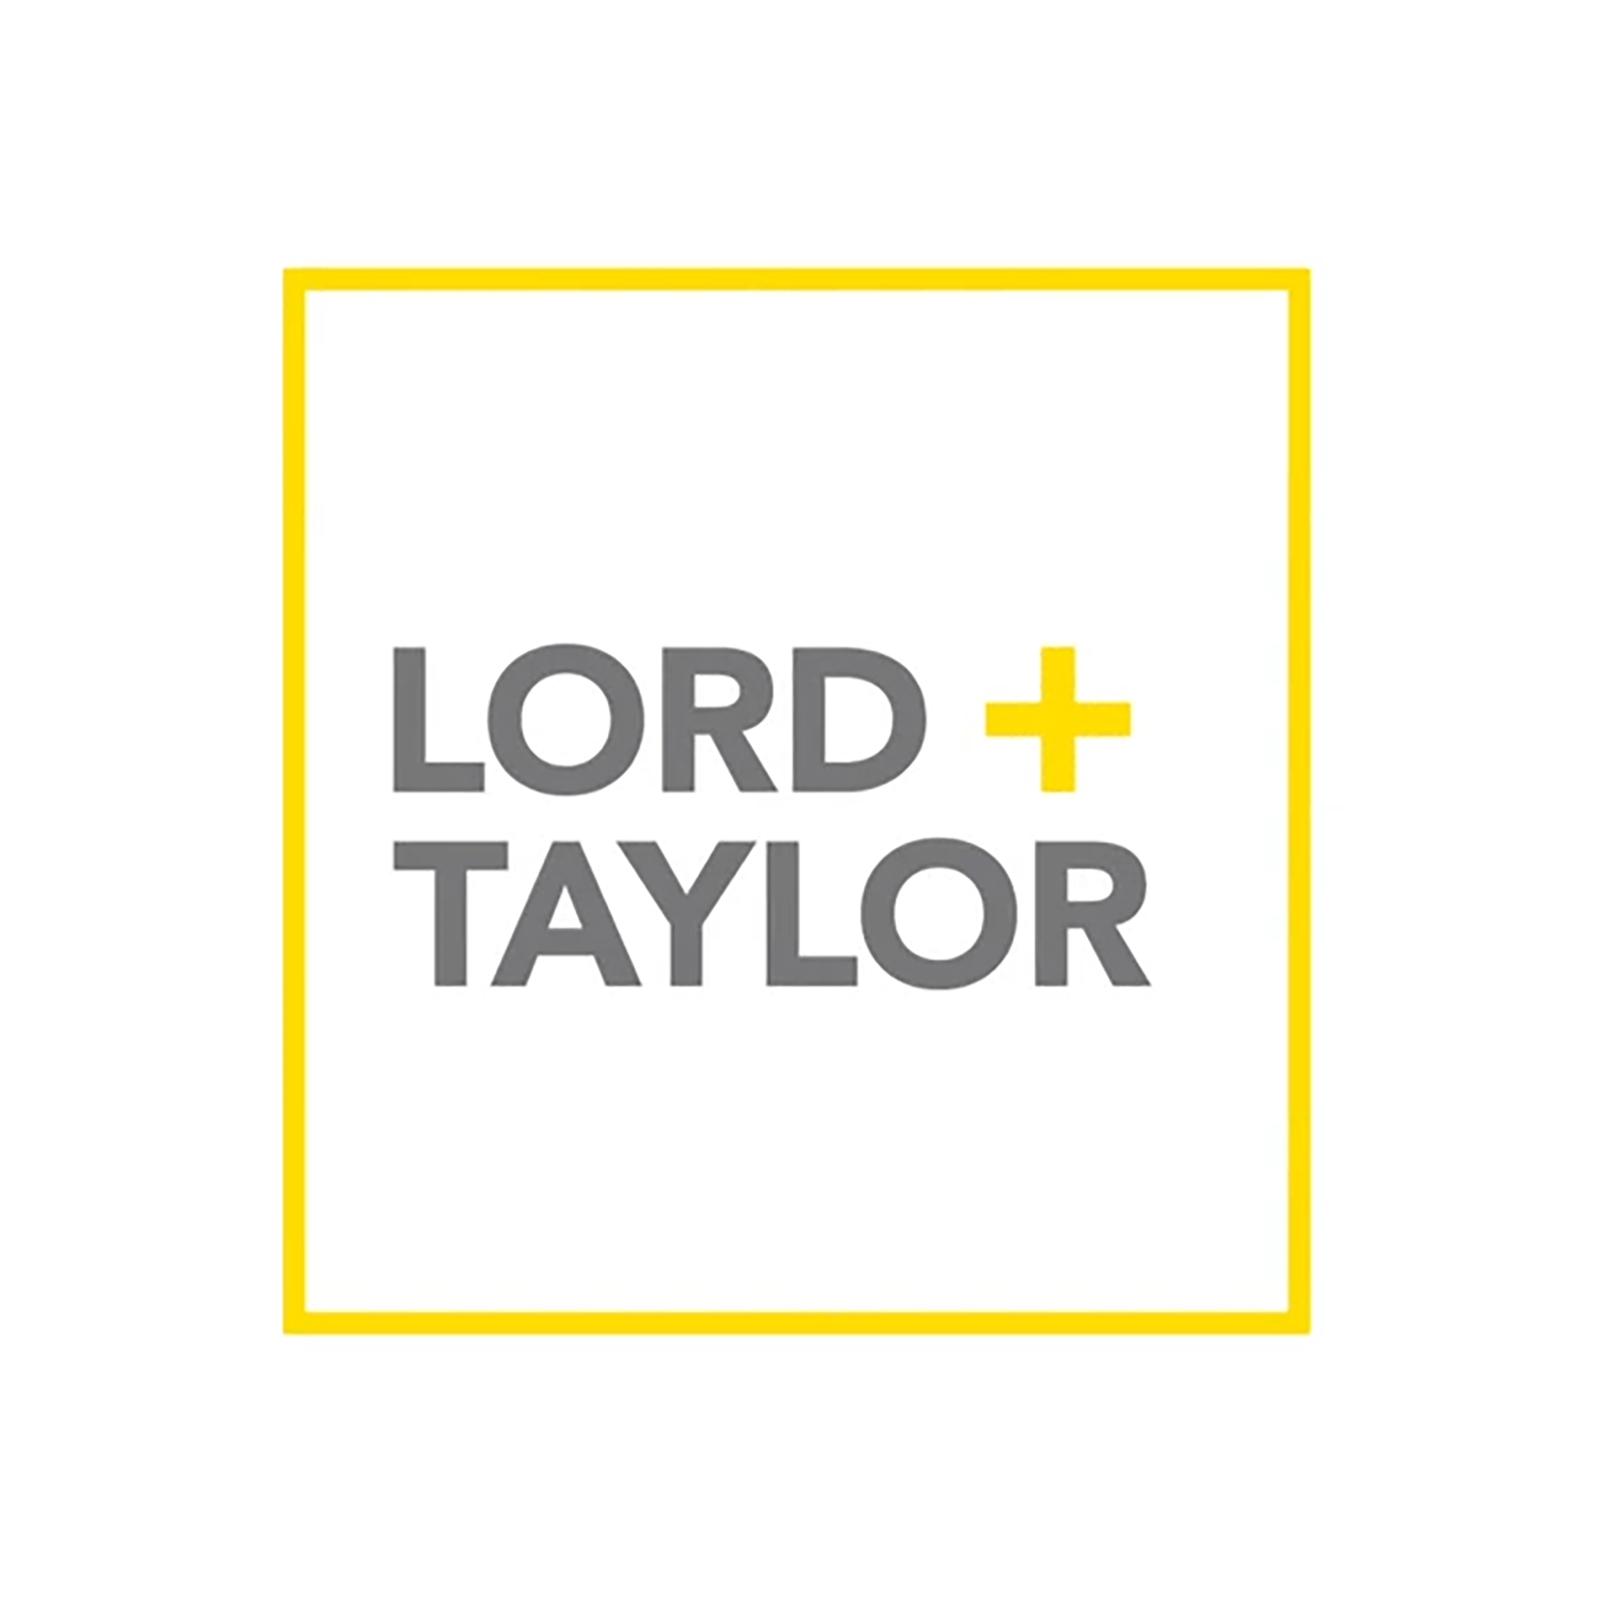 Lord + Taylor连锁商店品牌启用全新的品牌logo设计-深圳vi设计2